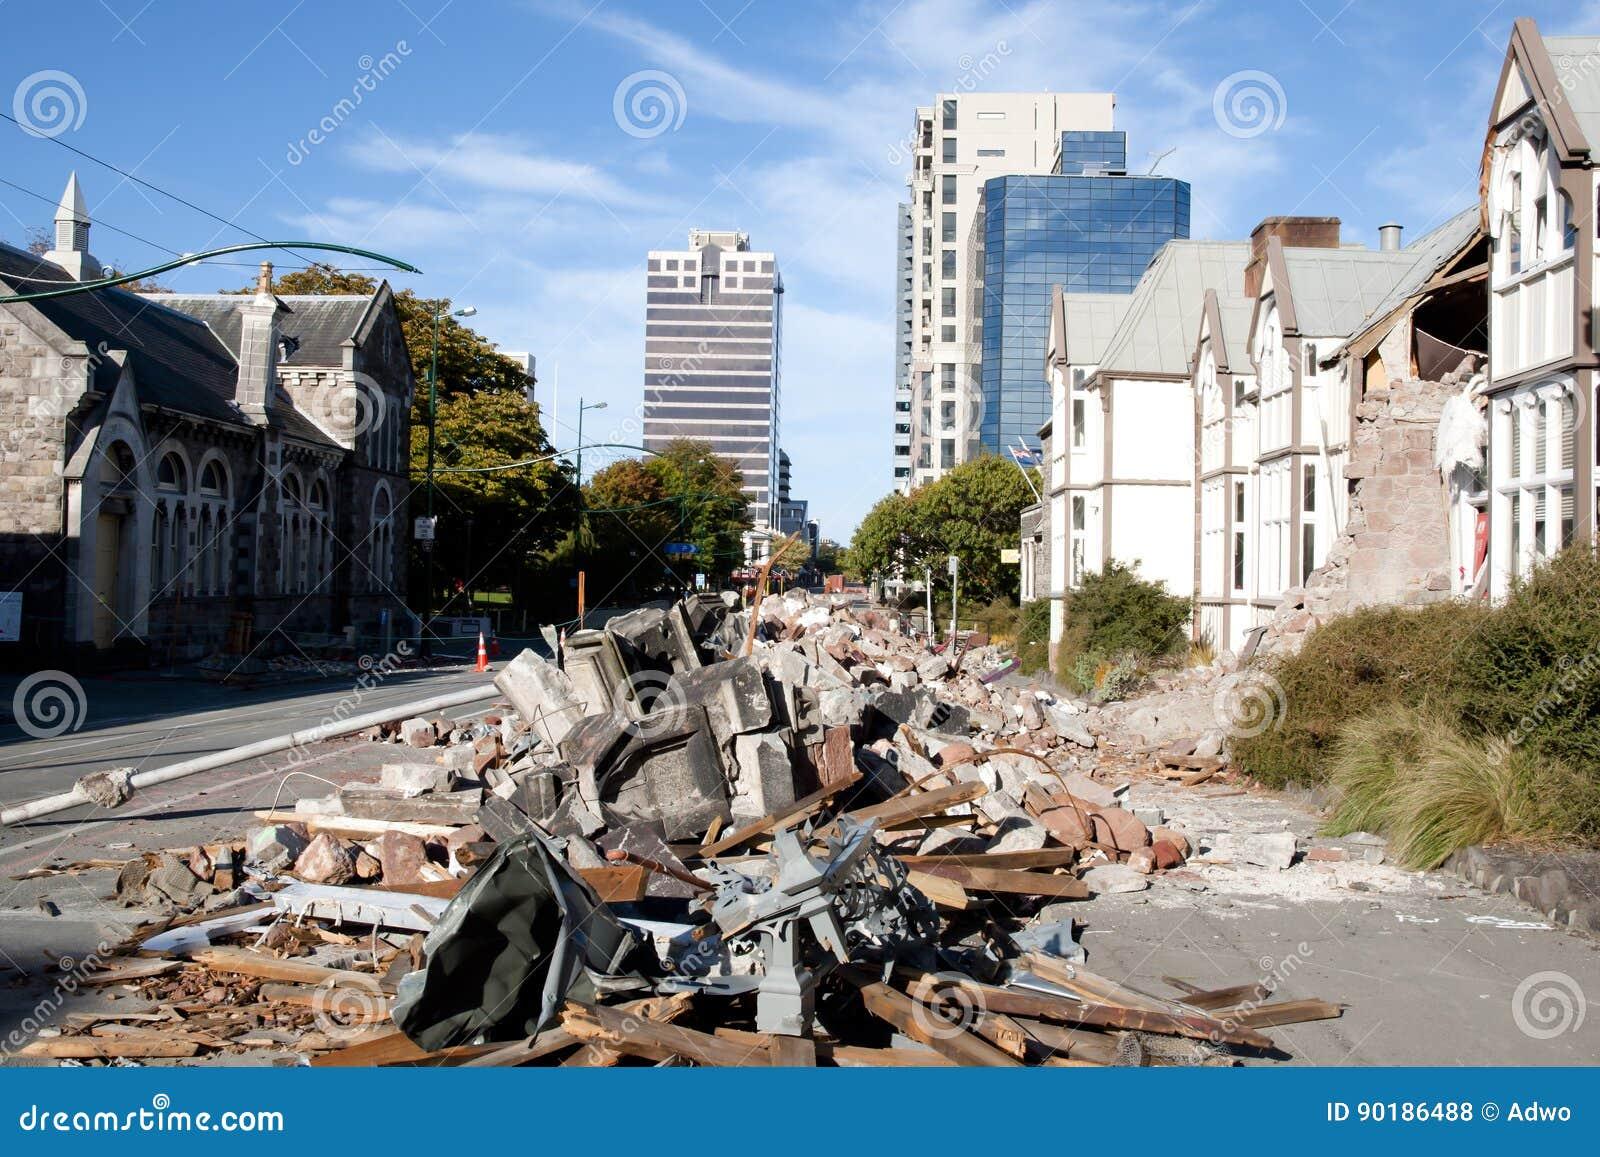 Christchurch Erdbeben 2011 Neuseeland Stockfoto Bild Von Neuseeland Erdbeben 90186488